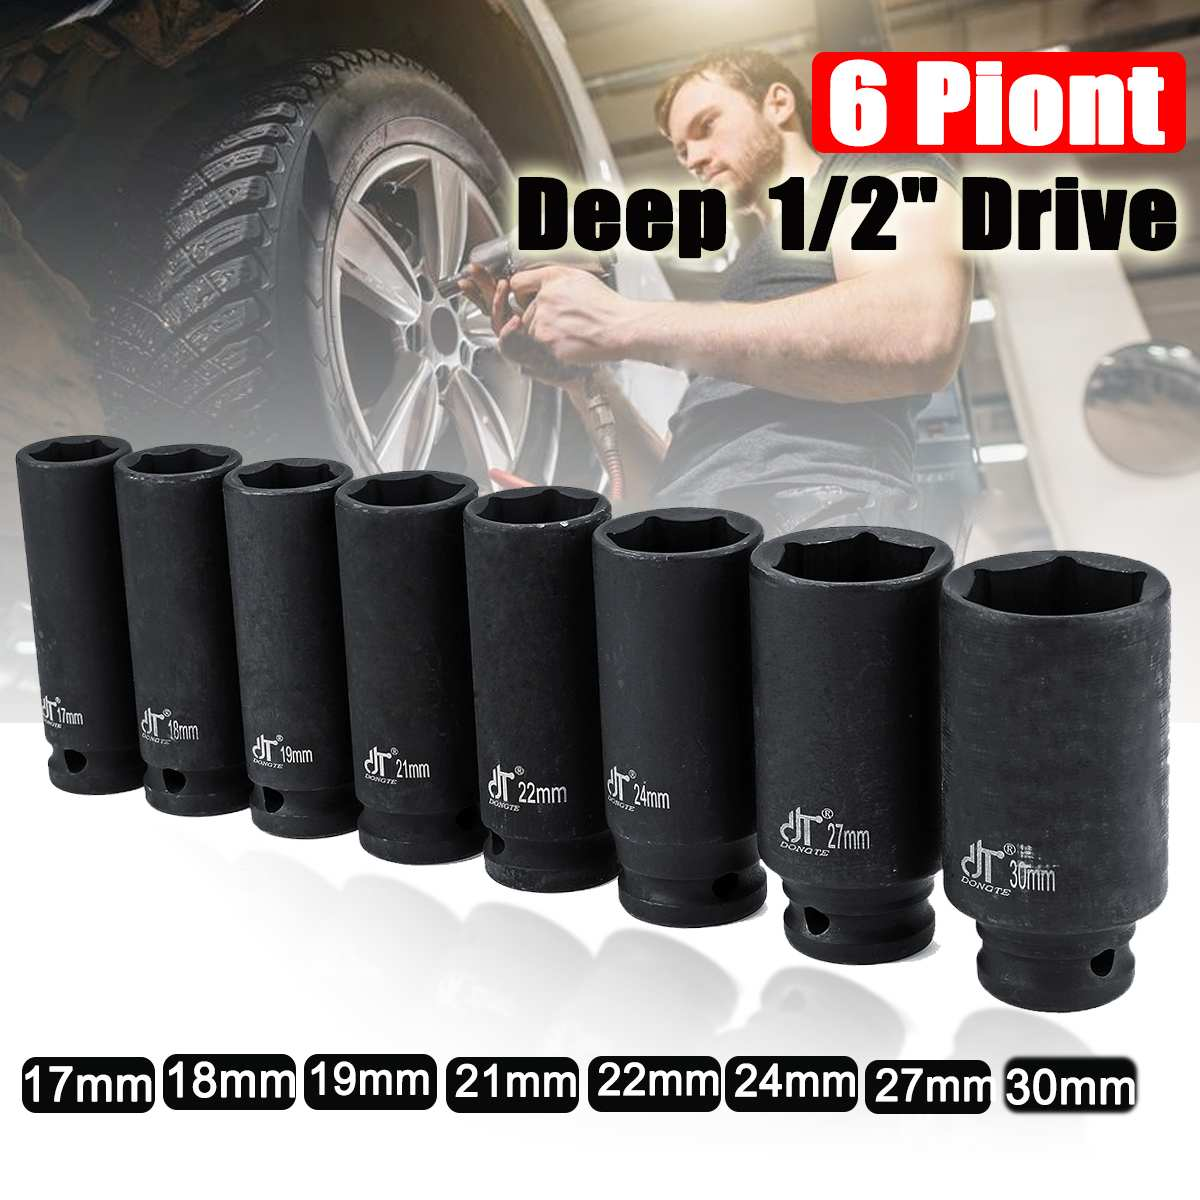 1/2 Inch Car Drive Deep Impact Sockets Metric Air Pneumatic Socket Wrench Head 17-30mm Standard Durable Auto Truck Repair Tools